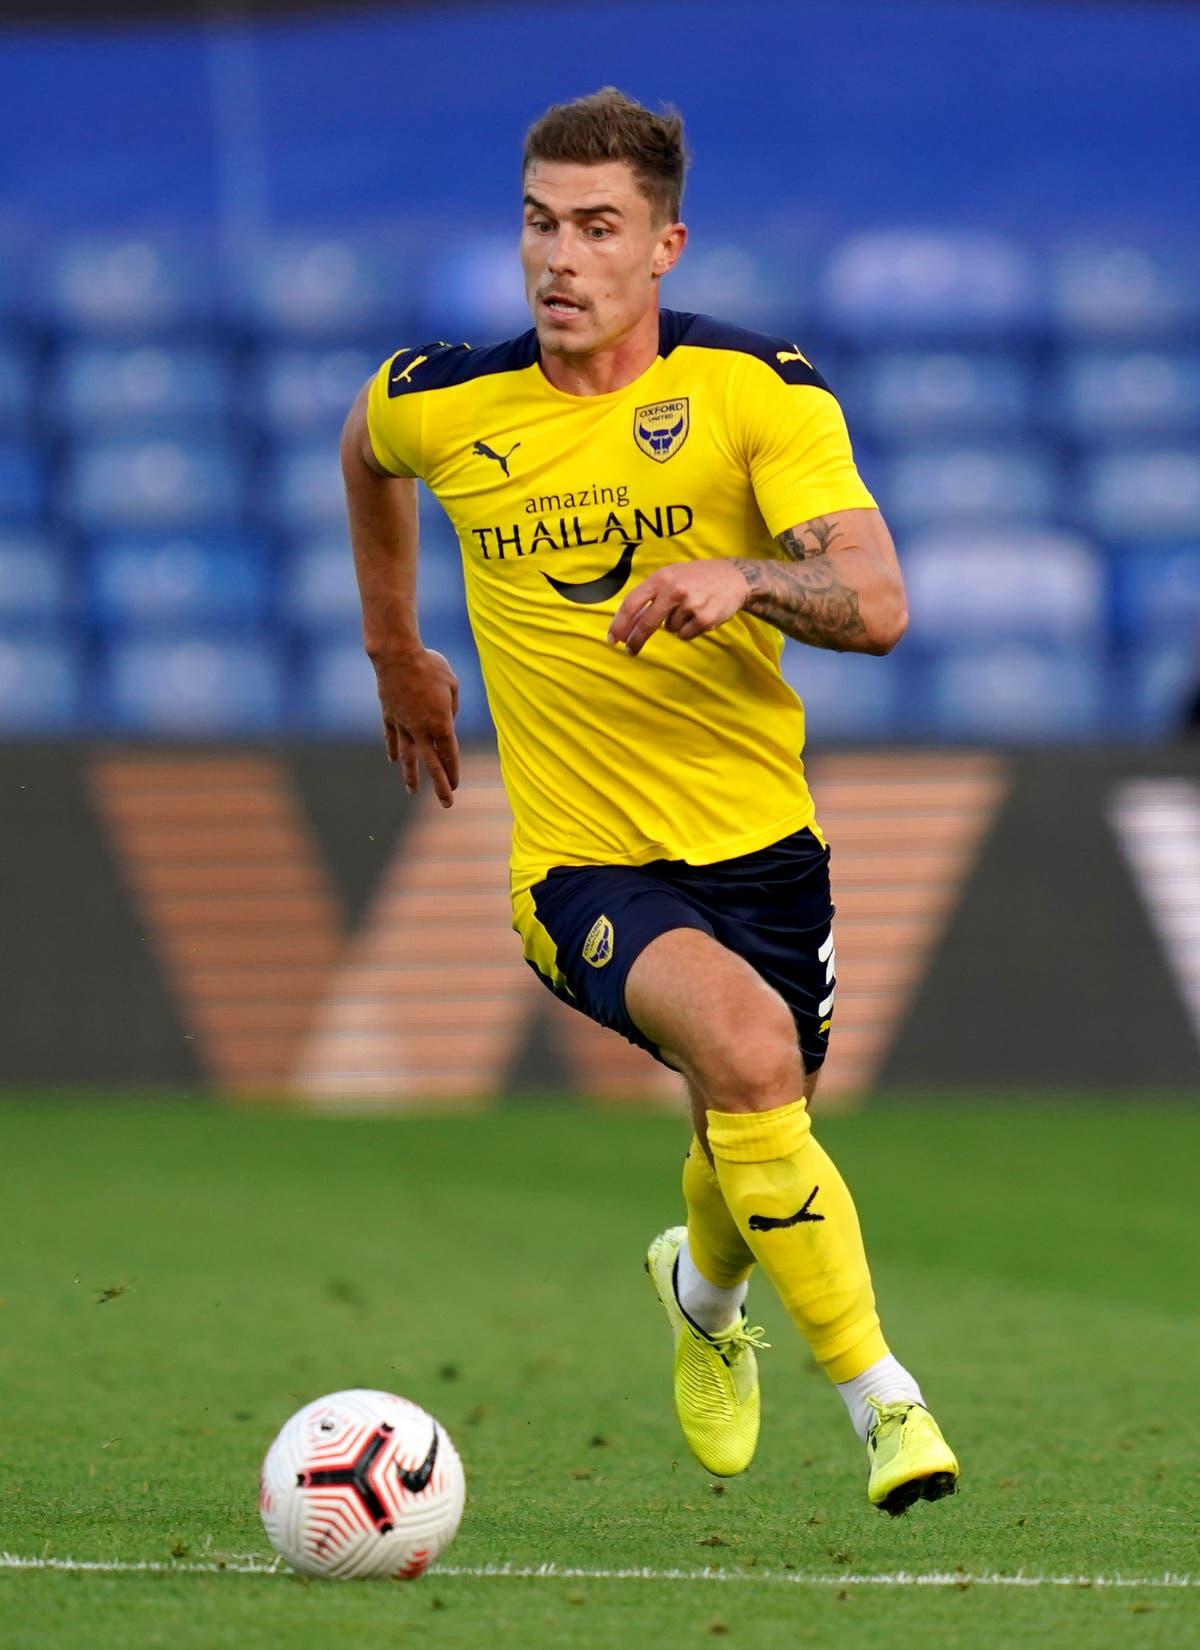 Oxford defender Josh Ruffels joins Huddersfield